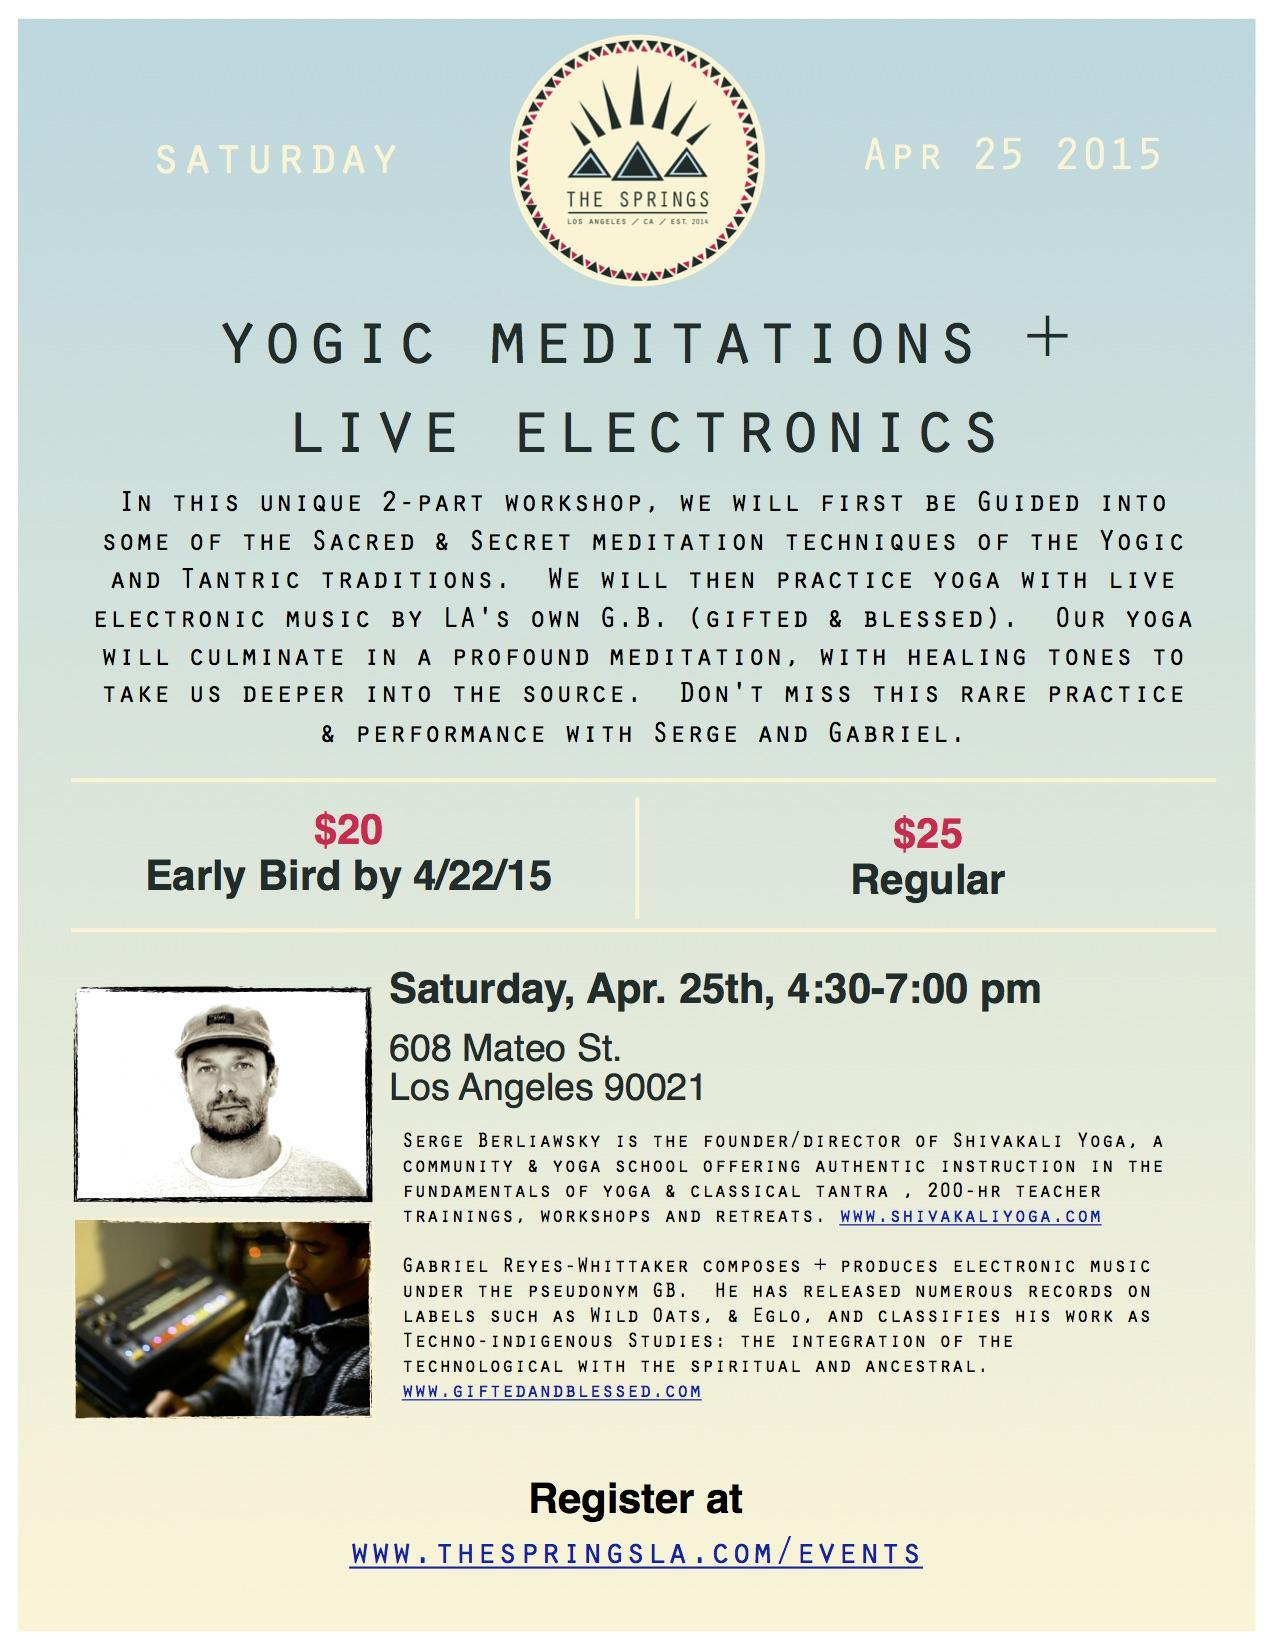 Yoga Workshop by Shivakali Yoga, a  Los Angeles-based Yoga Teacher Training and Yoga Certification School that holds Yoga Retreats and Workshops.